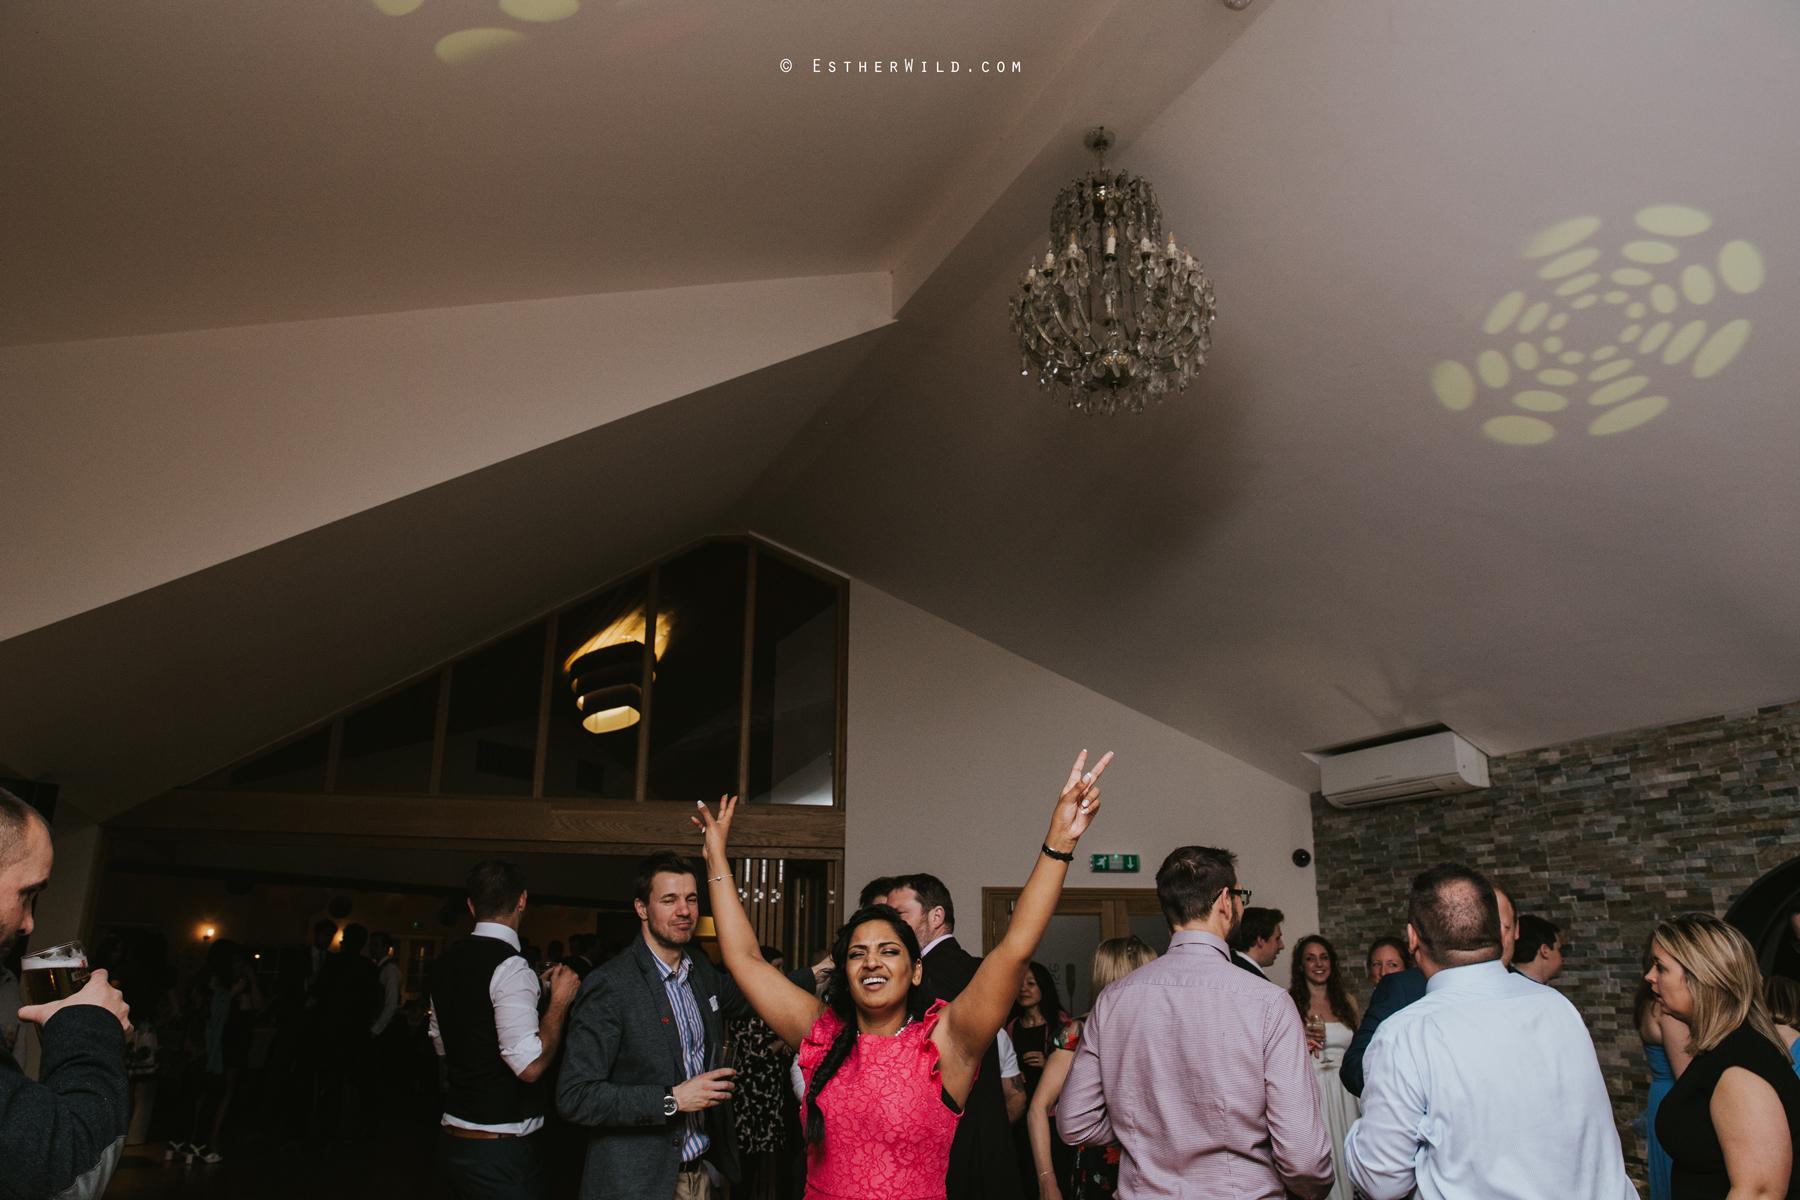 The_BoatHouse_Wedding_Venue_Ormesby_Norfolk_Broads_Boat_Wedding_Photography_Esther_Wild_Photographer_IMG_3866.jpg